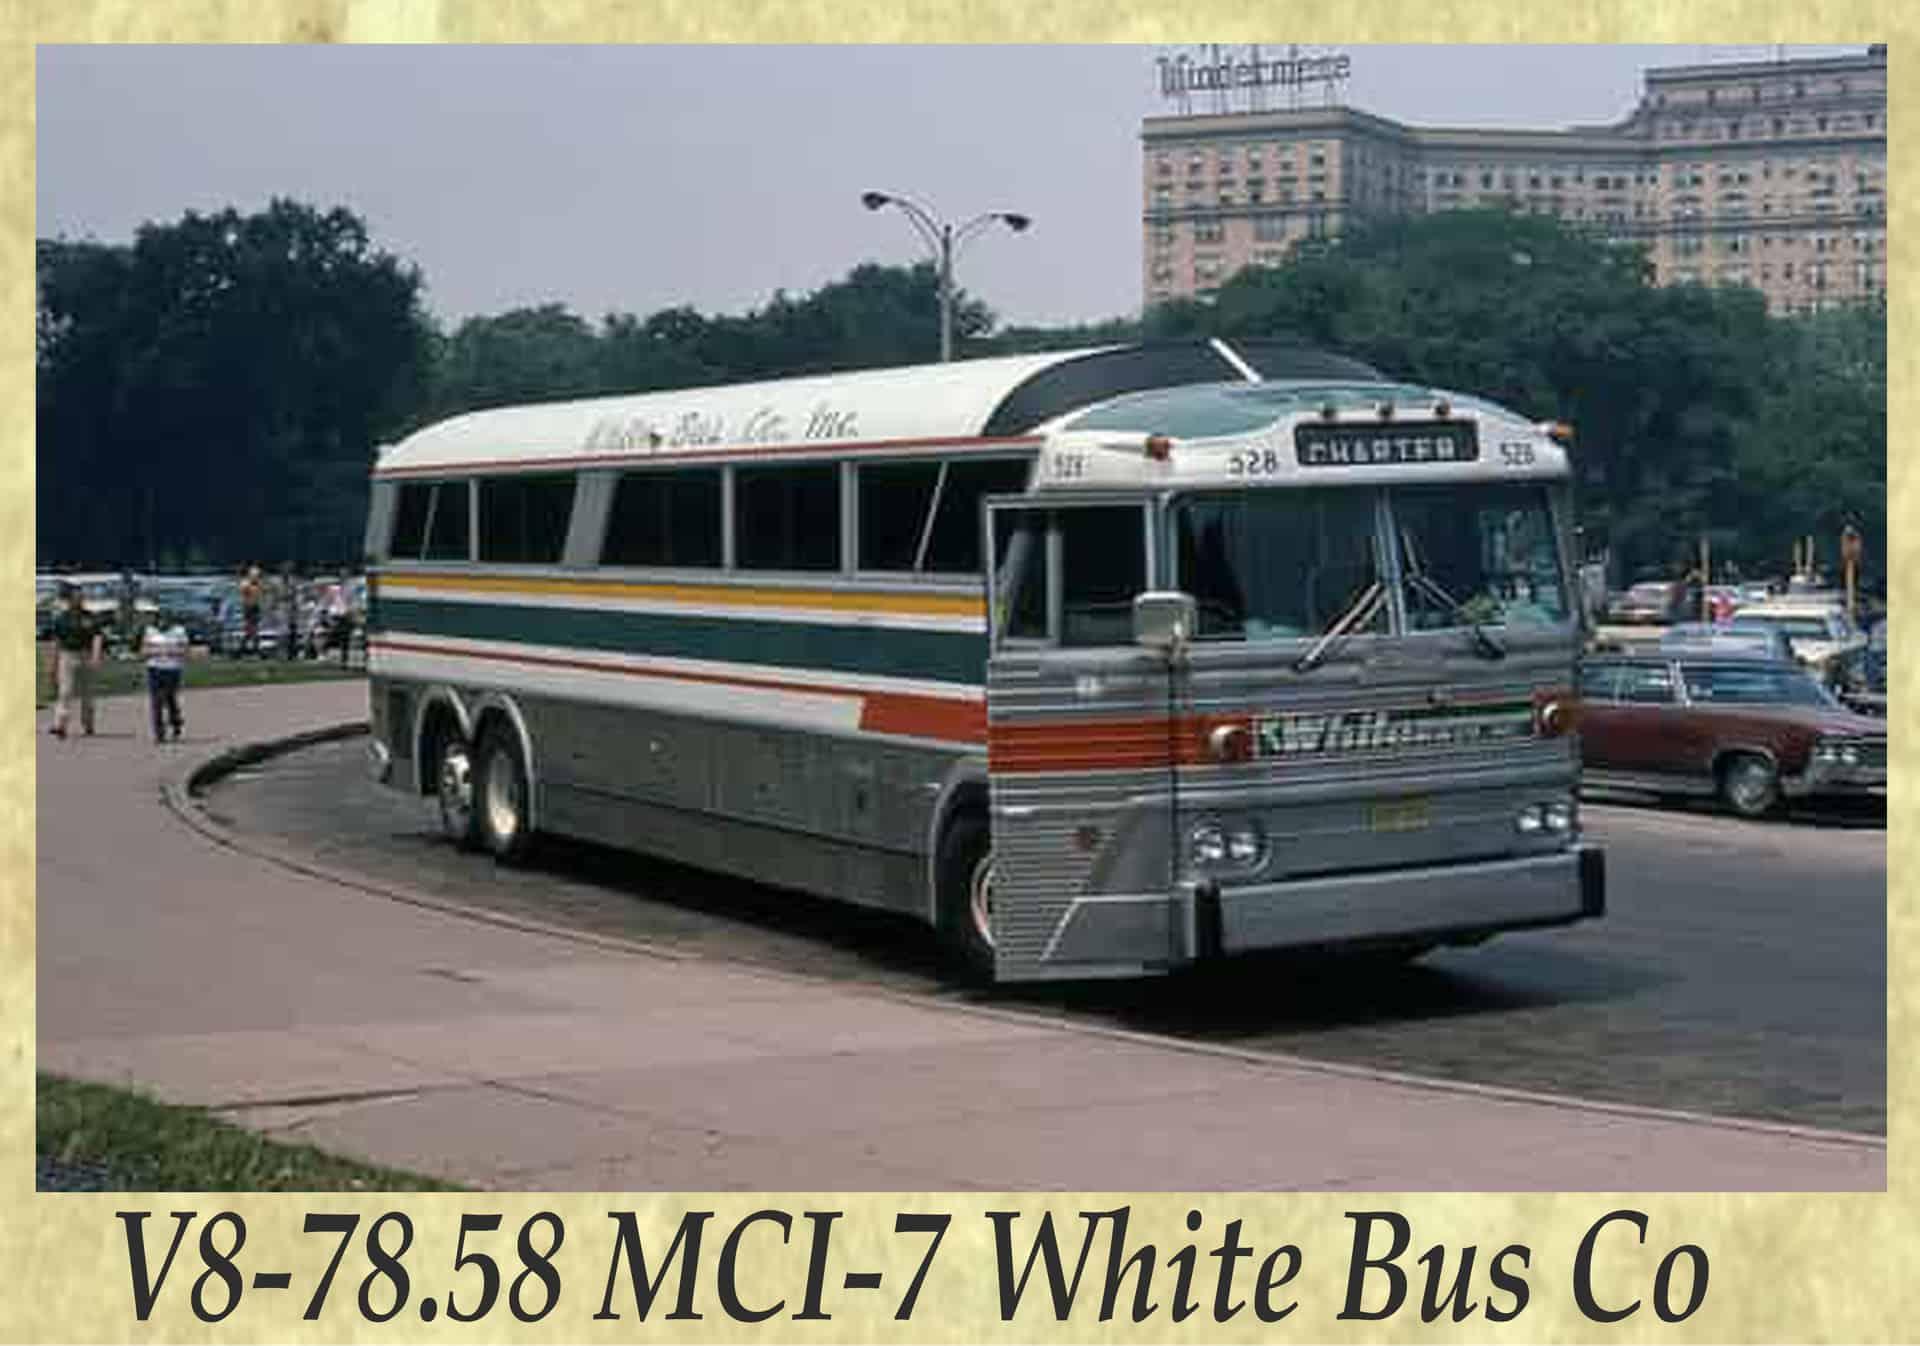 V8-78.58 MCI-7 White Bus Co